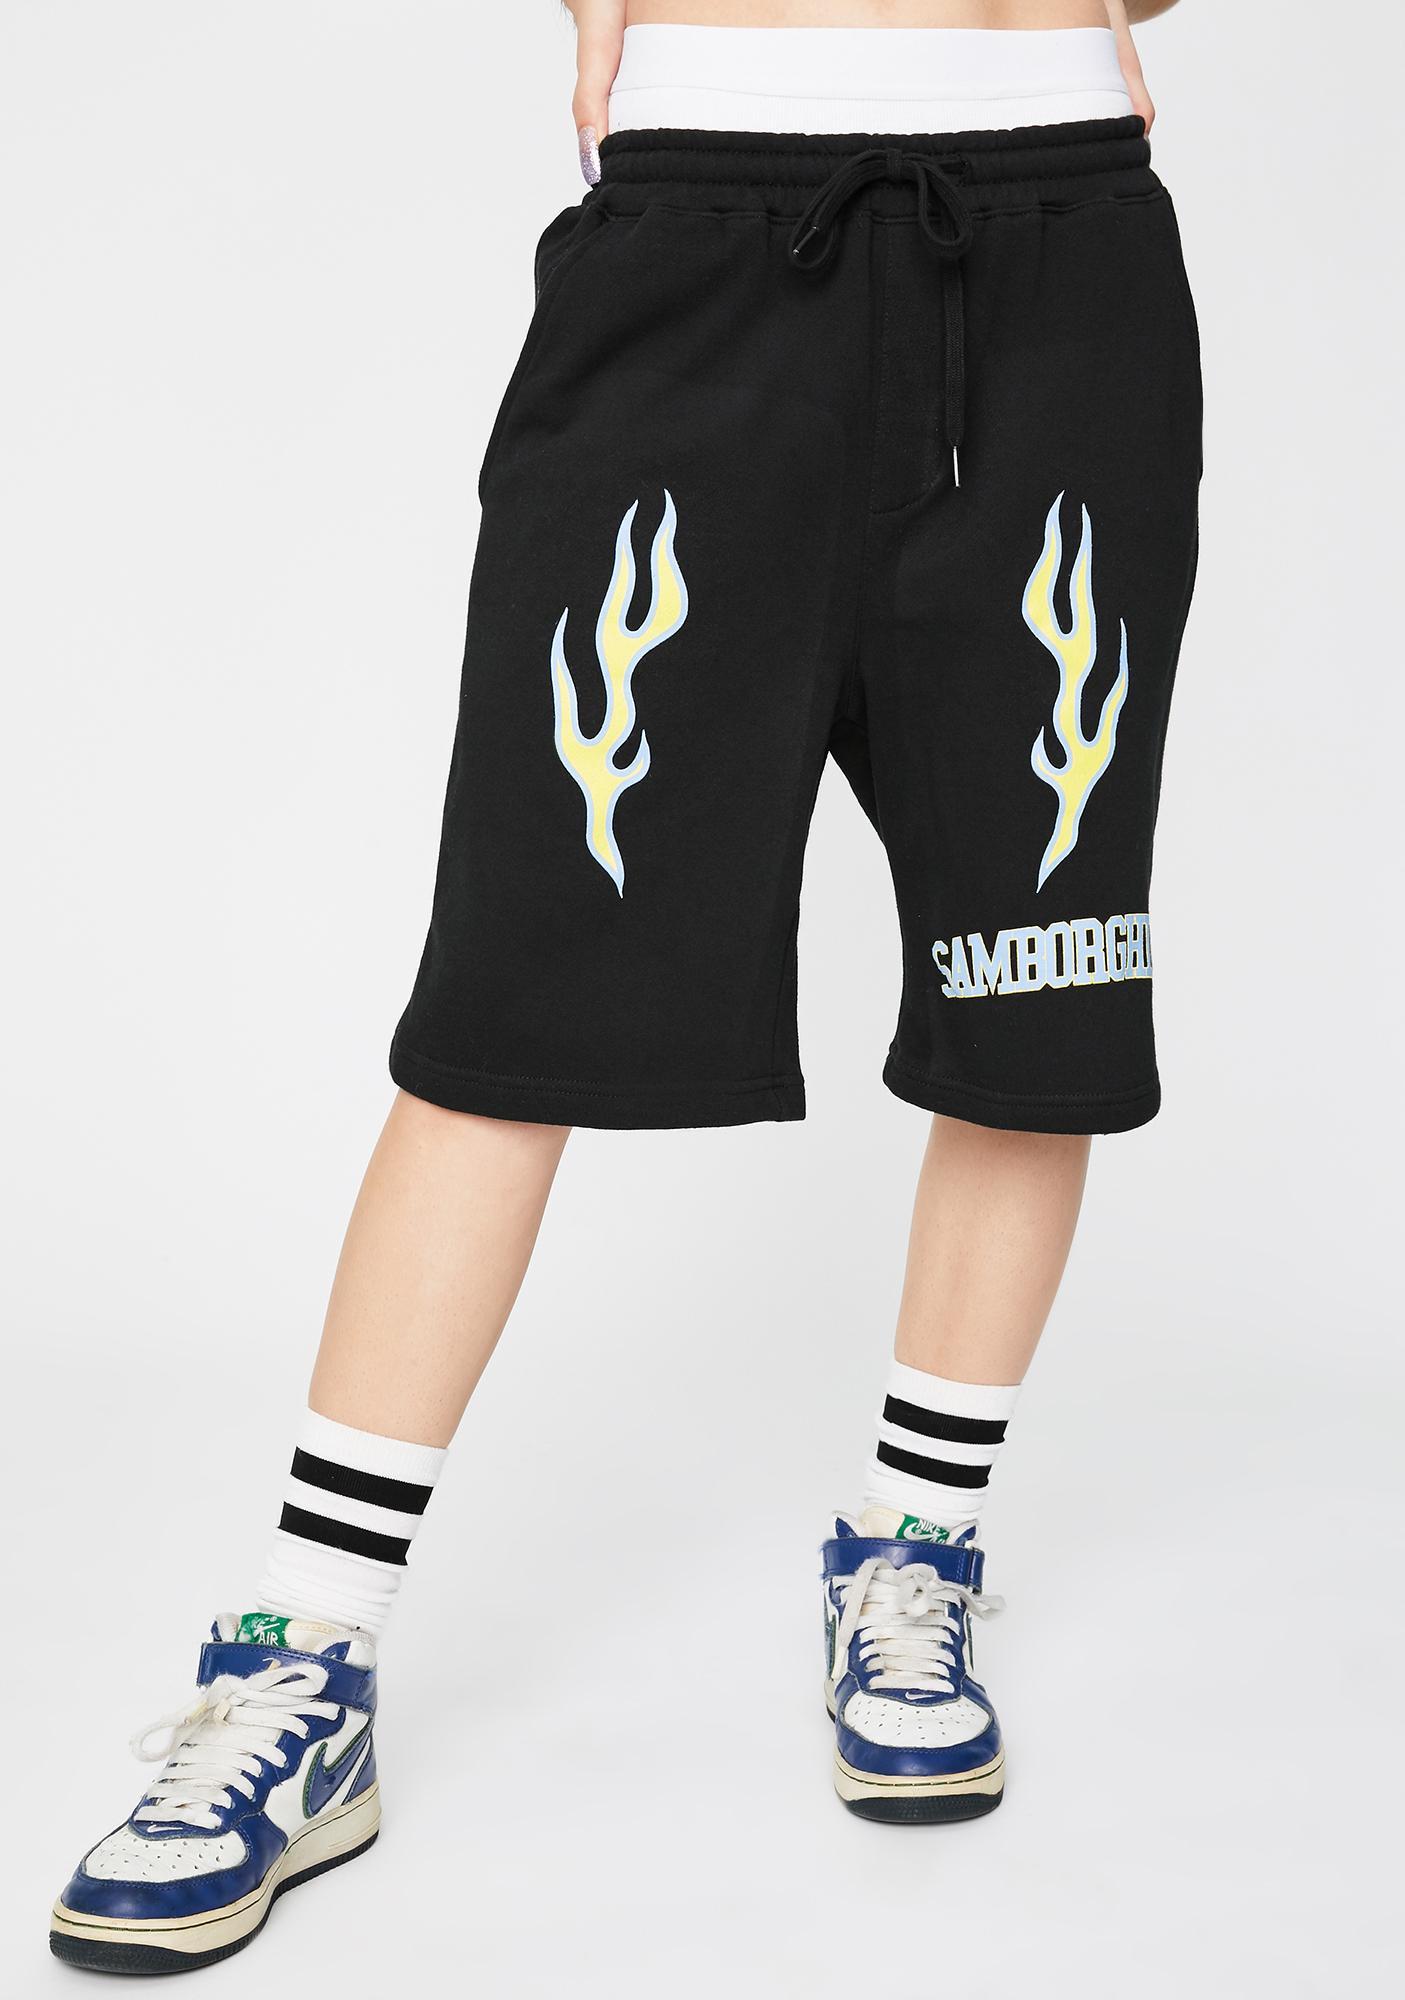 Samborghini Spider University Basketball Shorts